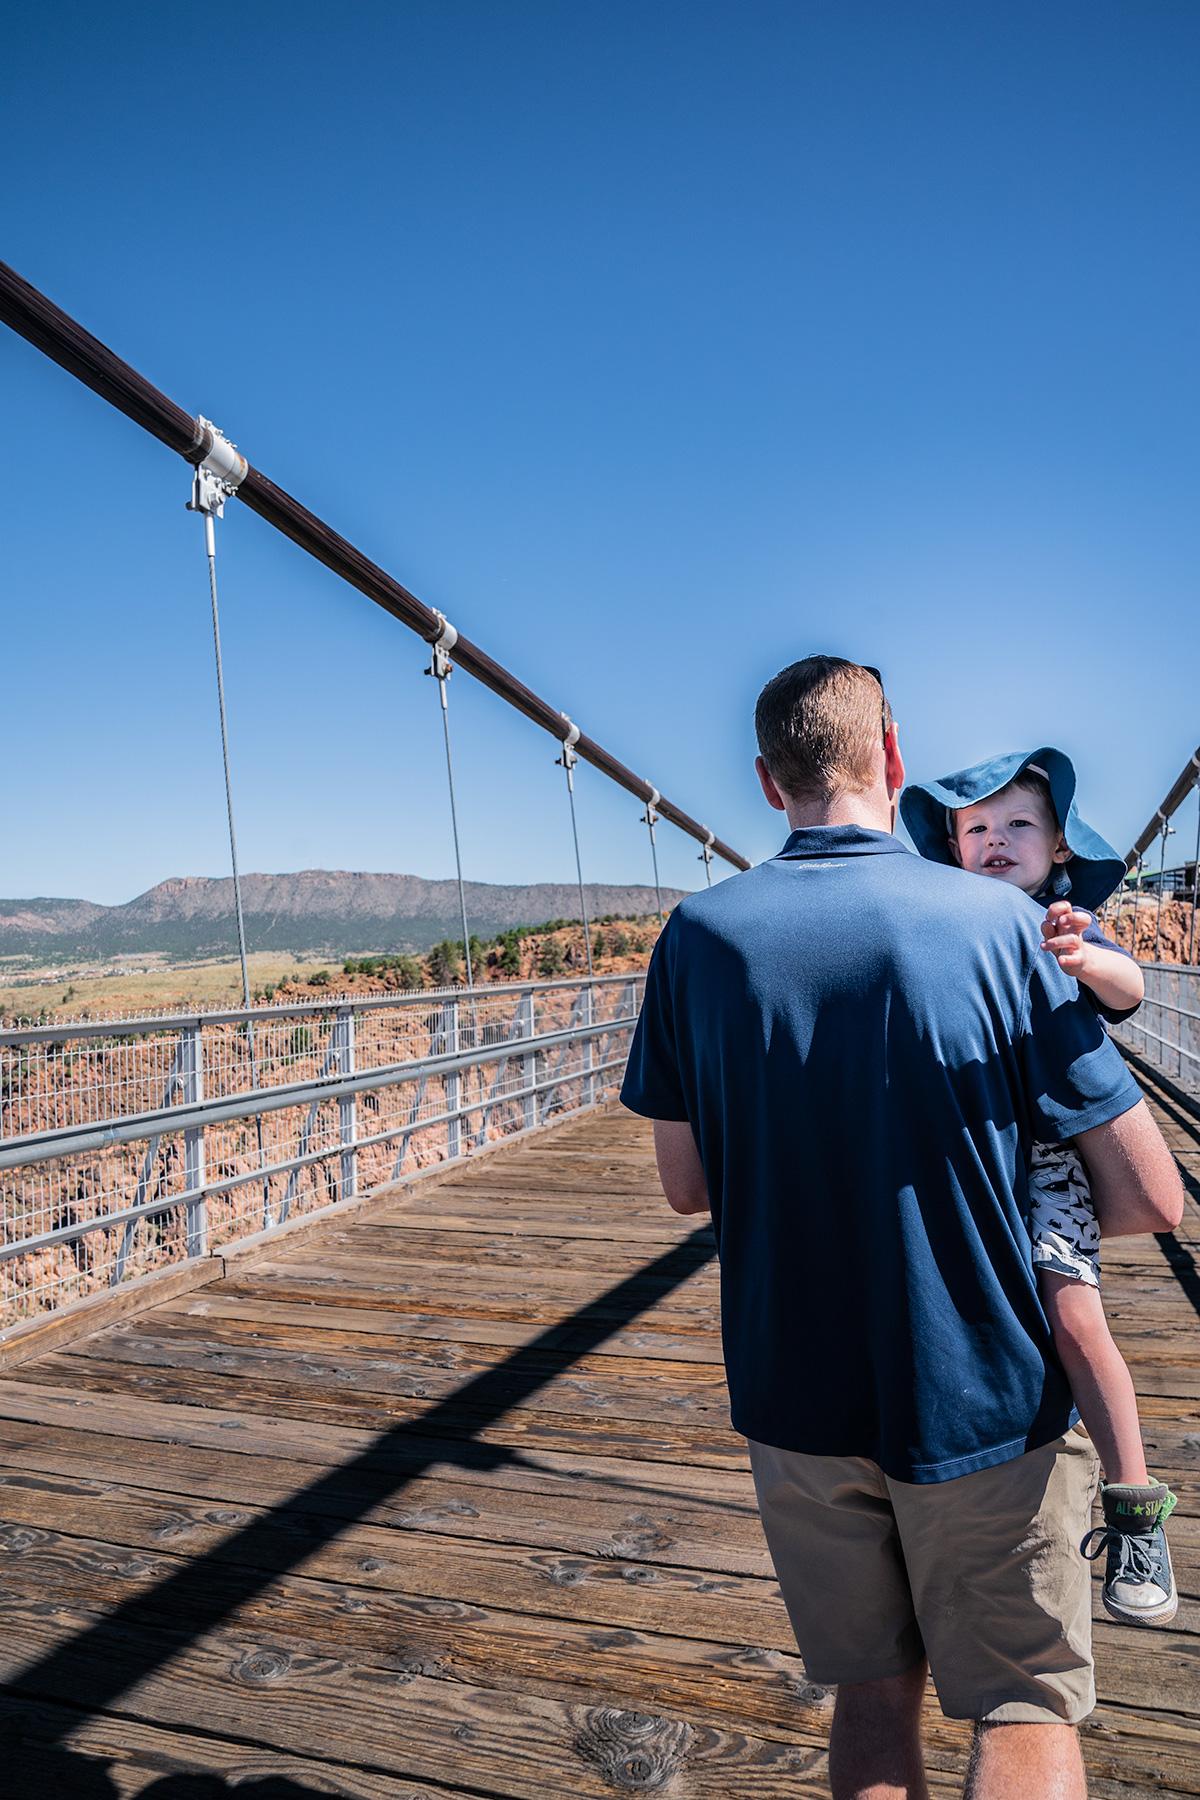 Walking-over-the-Royal-Gorge-Bridge-Colorado